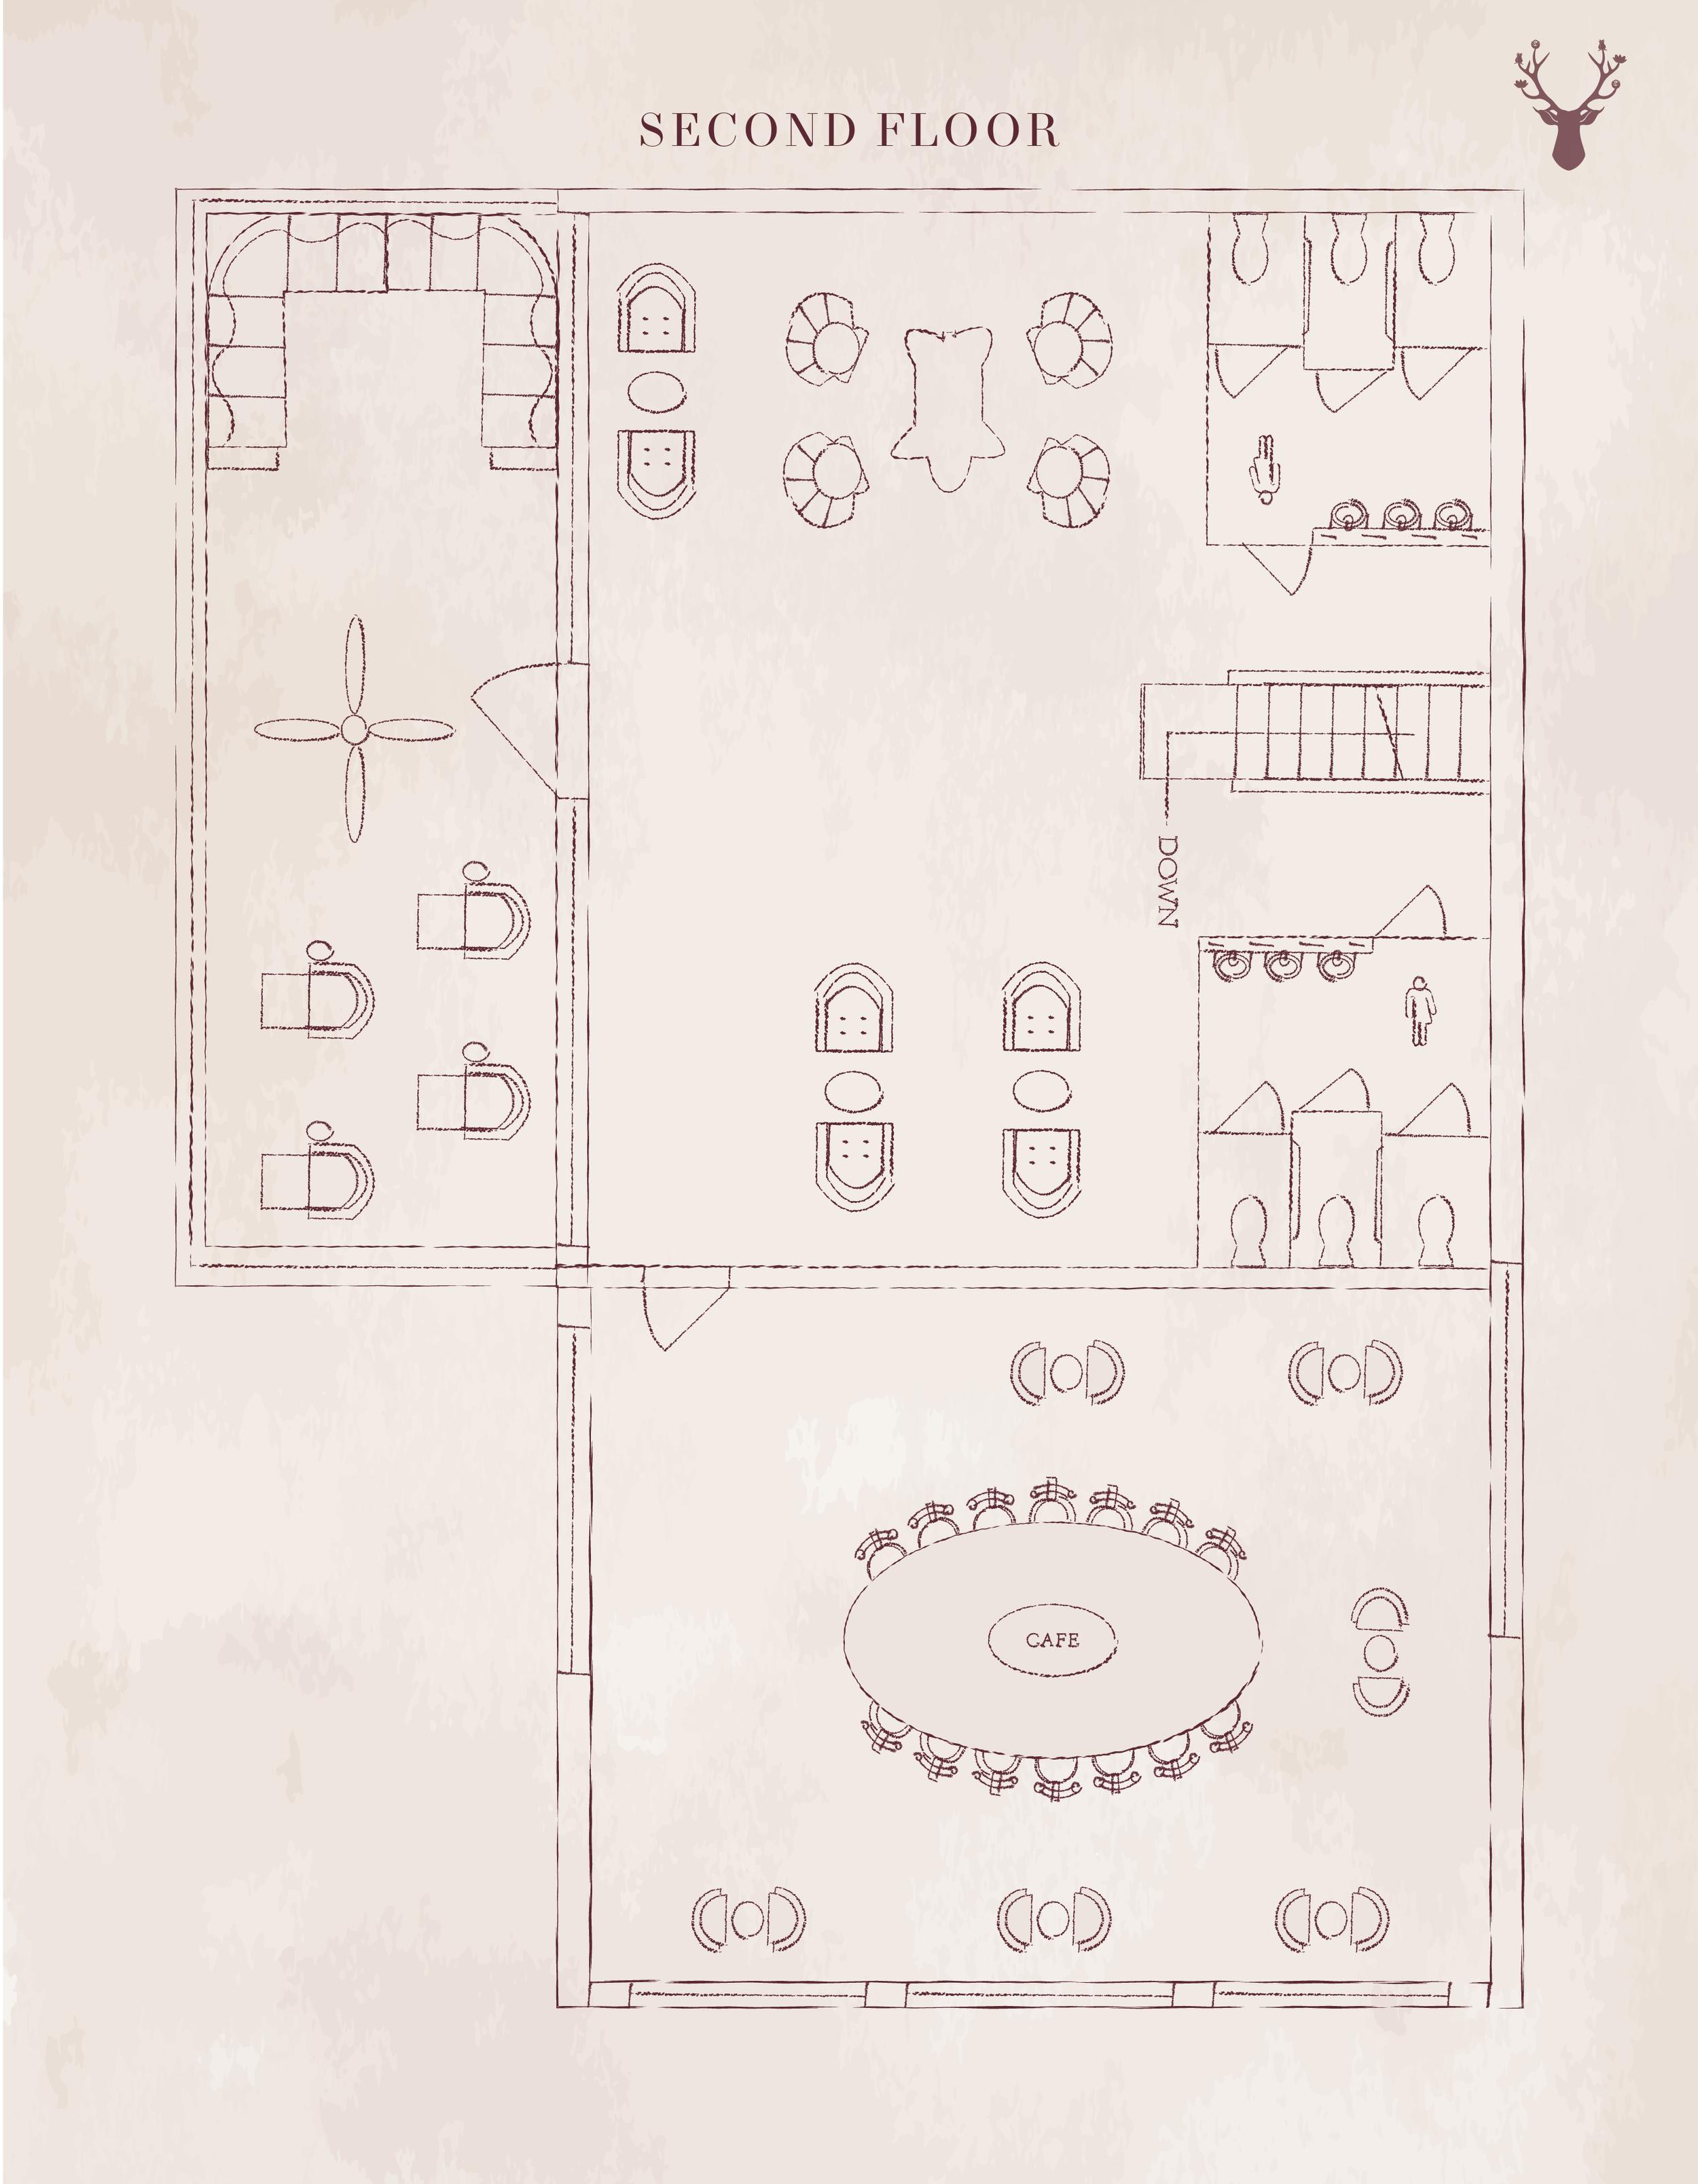 Garden District Den-02.png